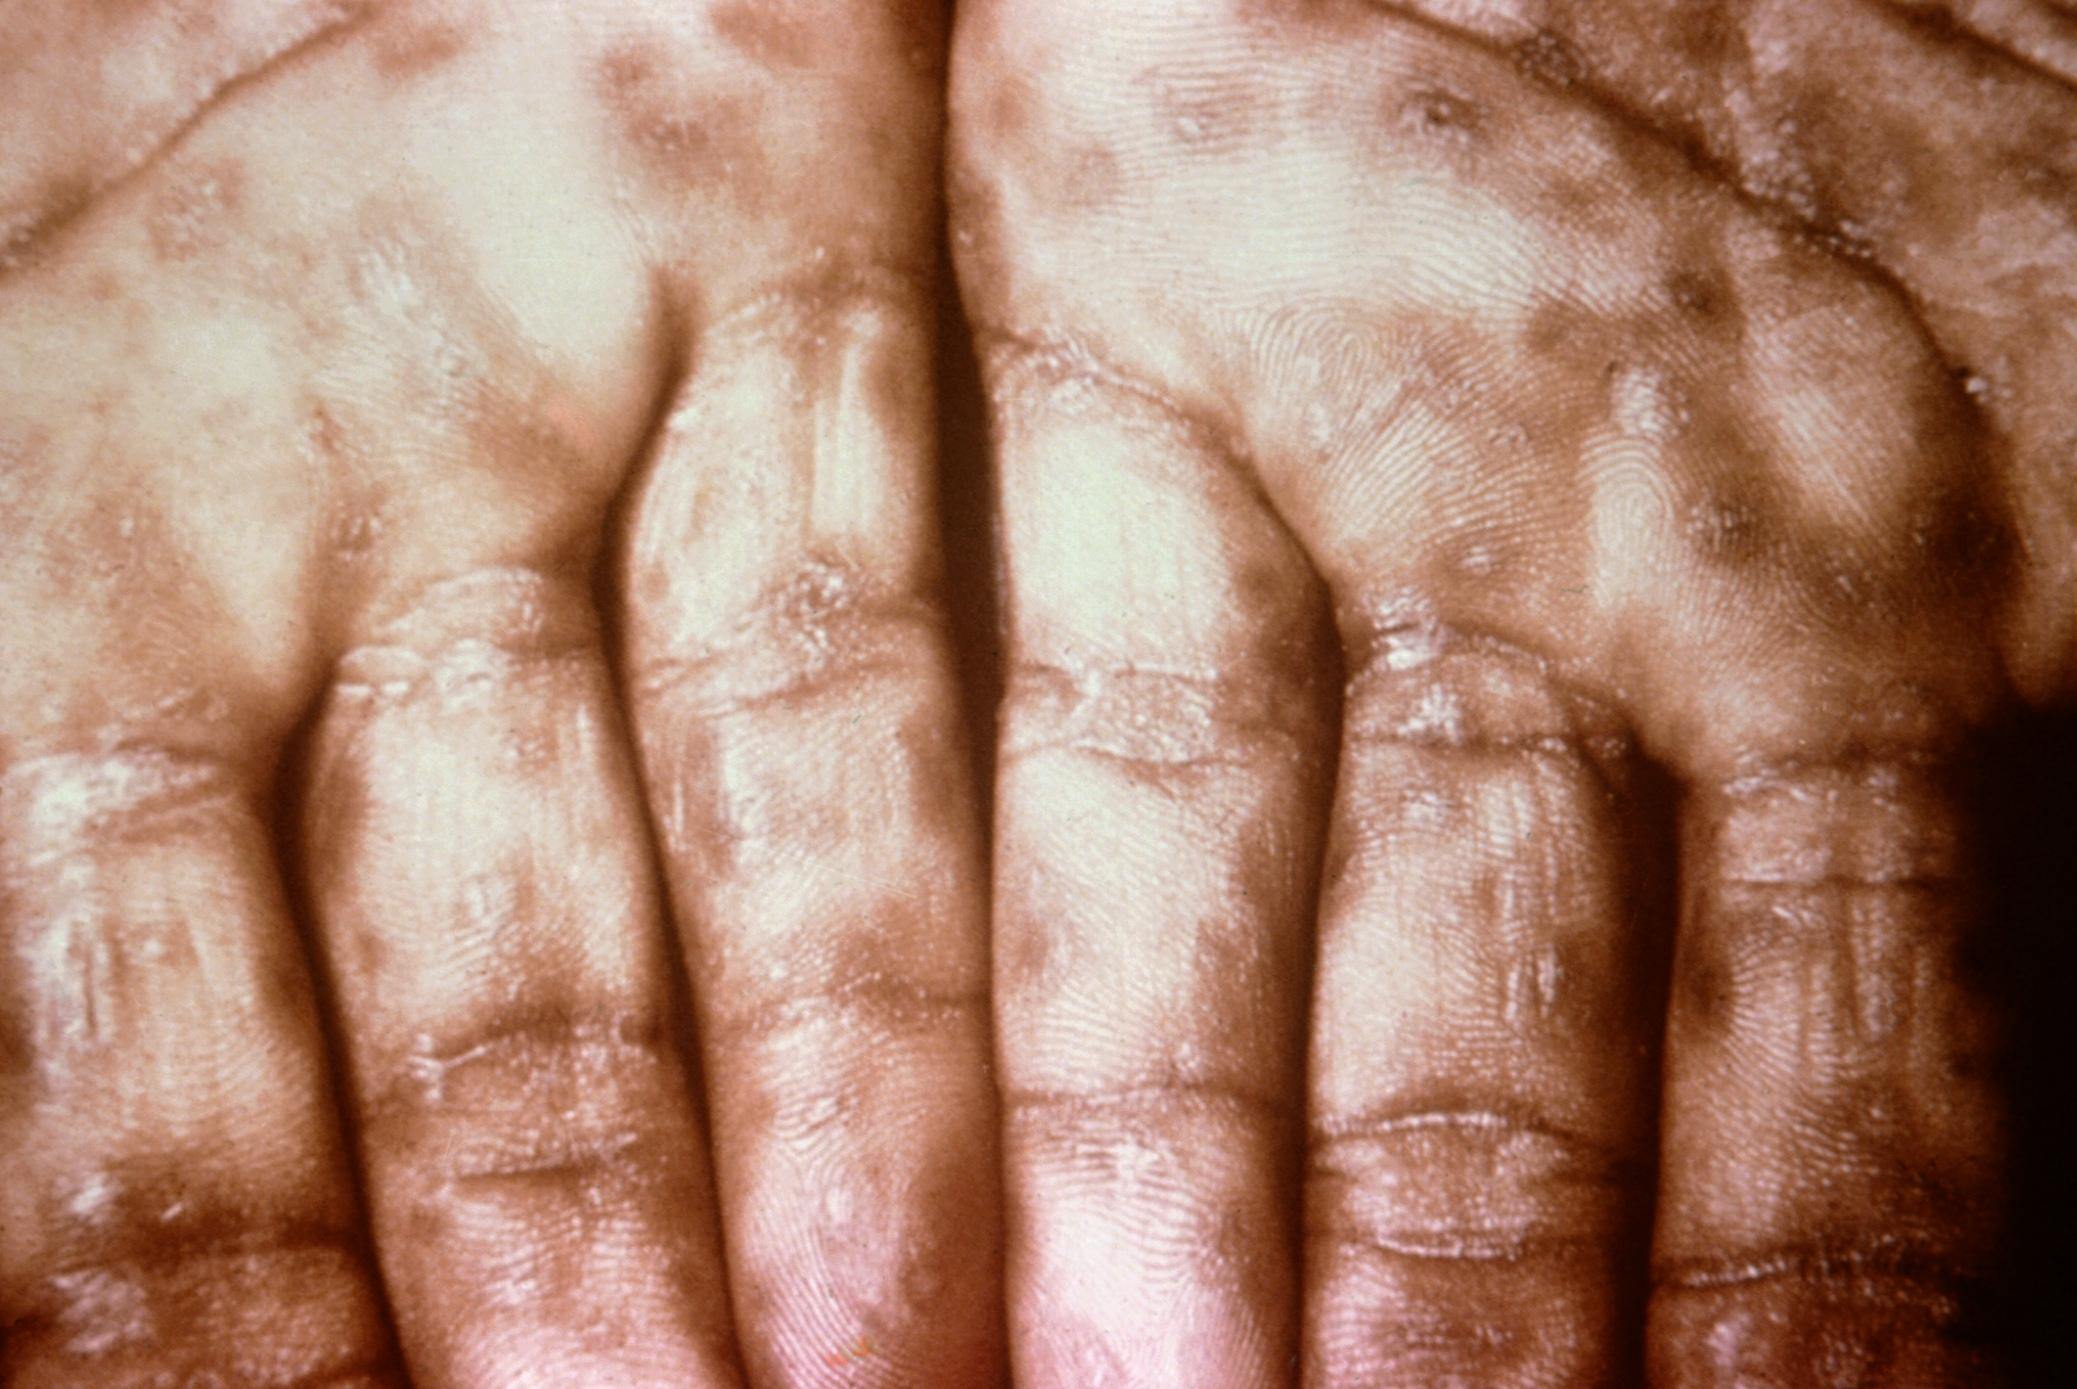 symptome seropositif